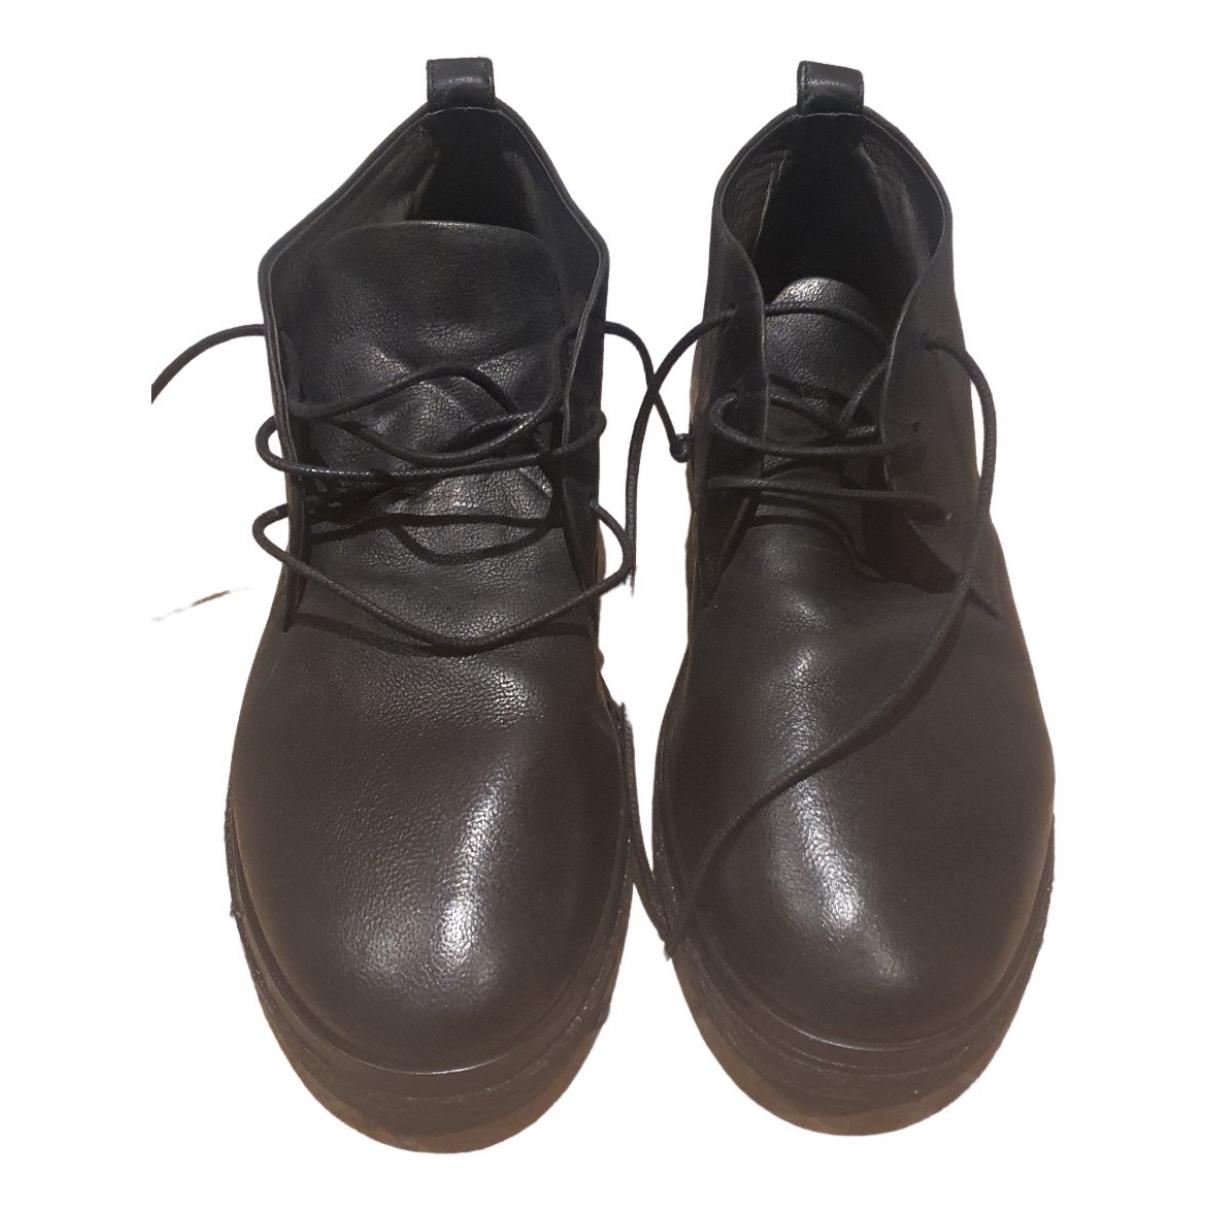 Marsèll \N Black Leather Boots for Men 41.5 EU